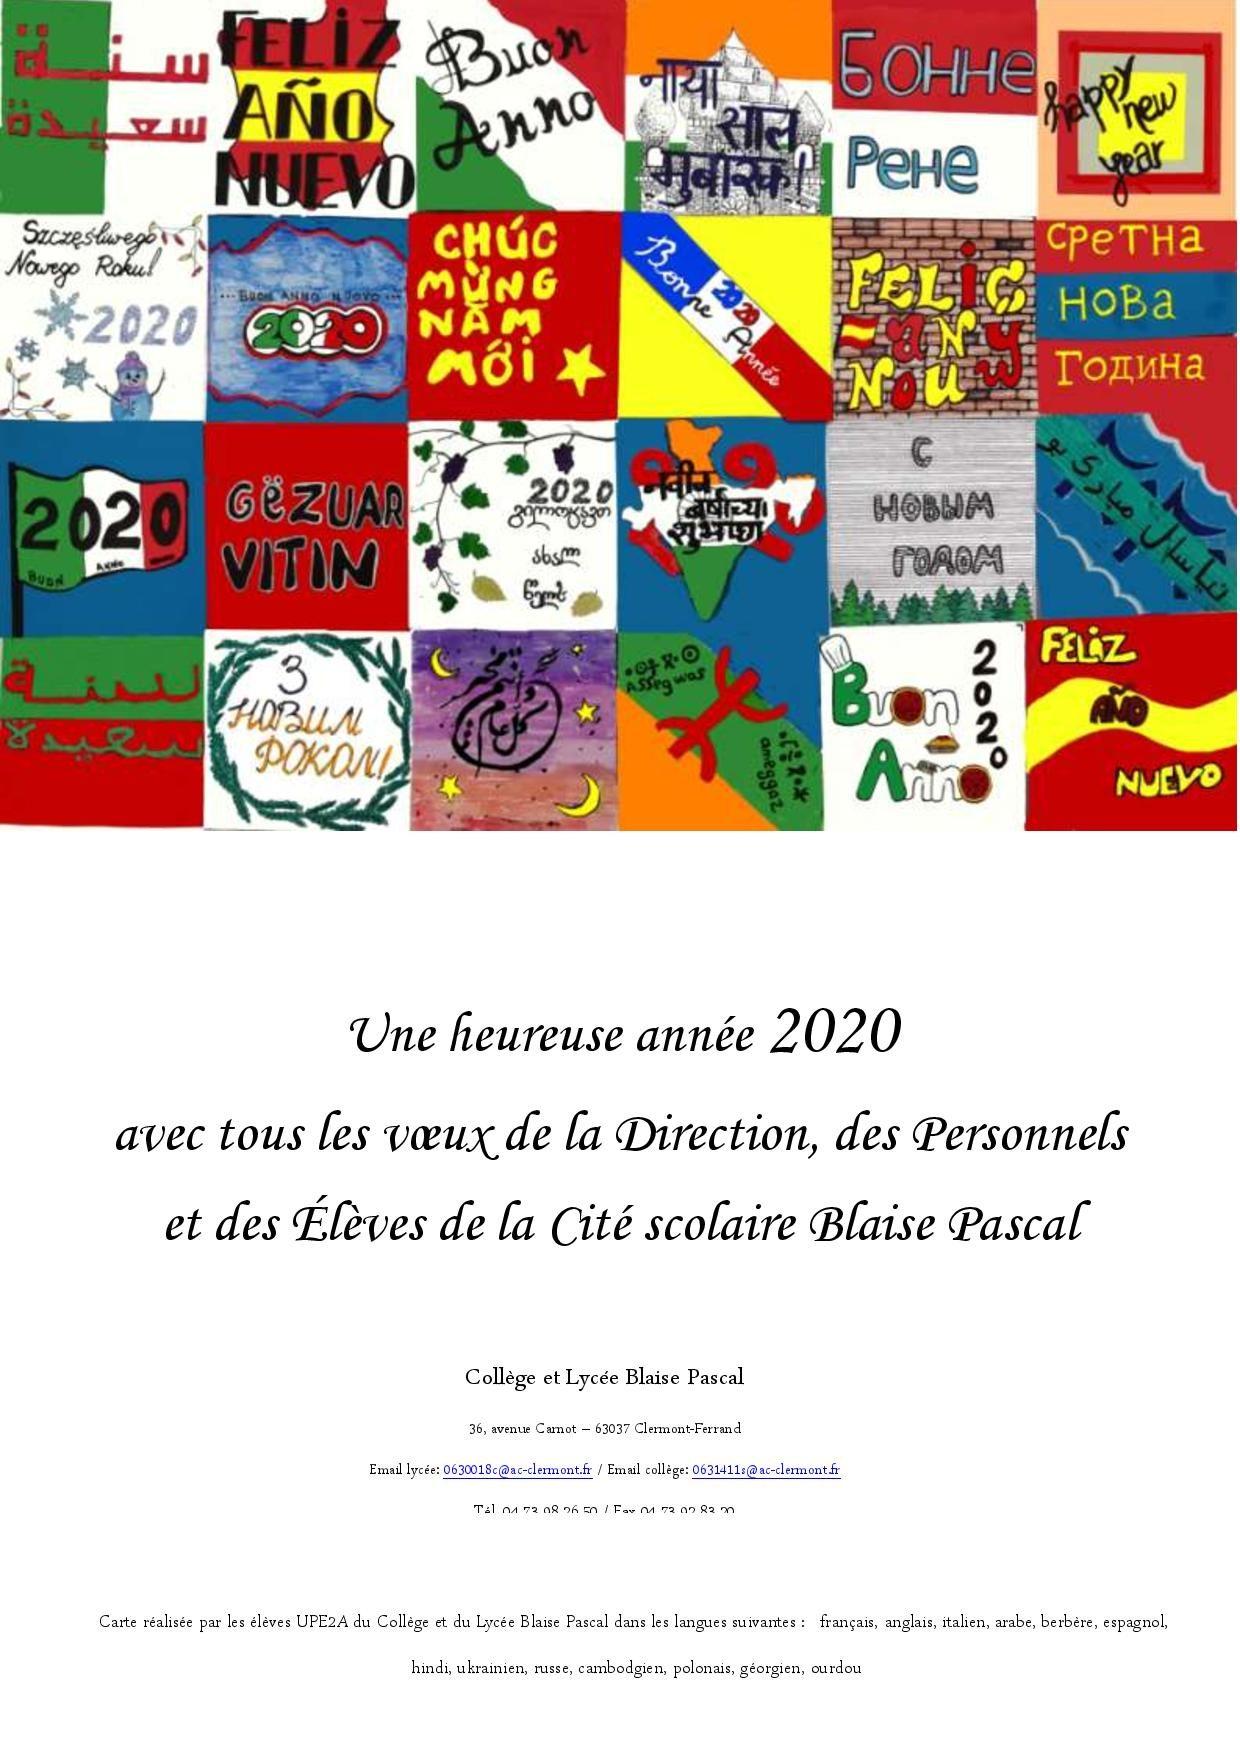 carte de voeux BP 2020-1-page-001.jpg